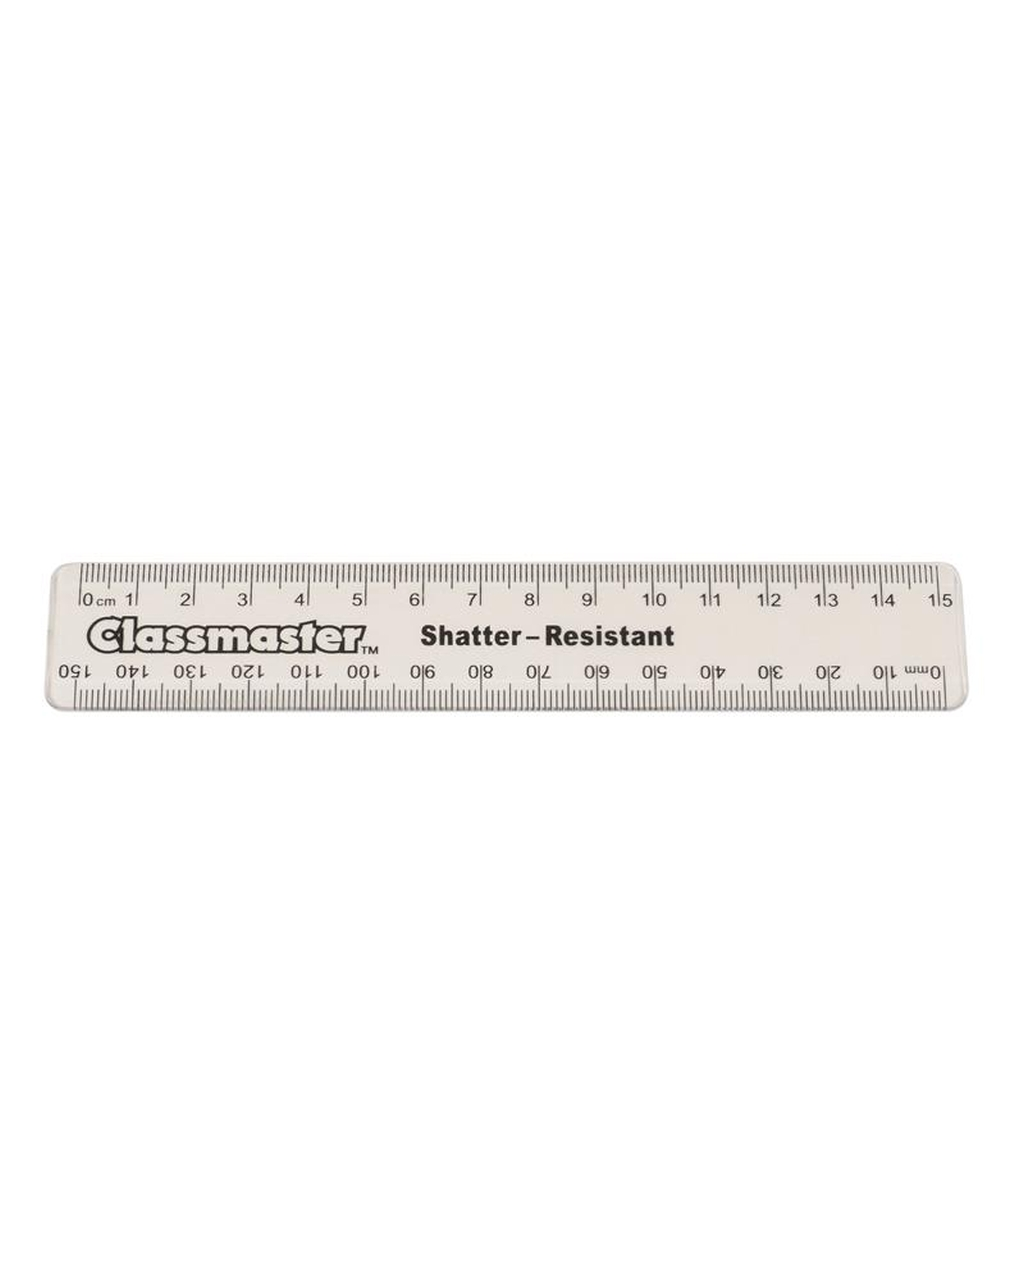 15cm Clear Plastic Ruler